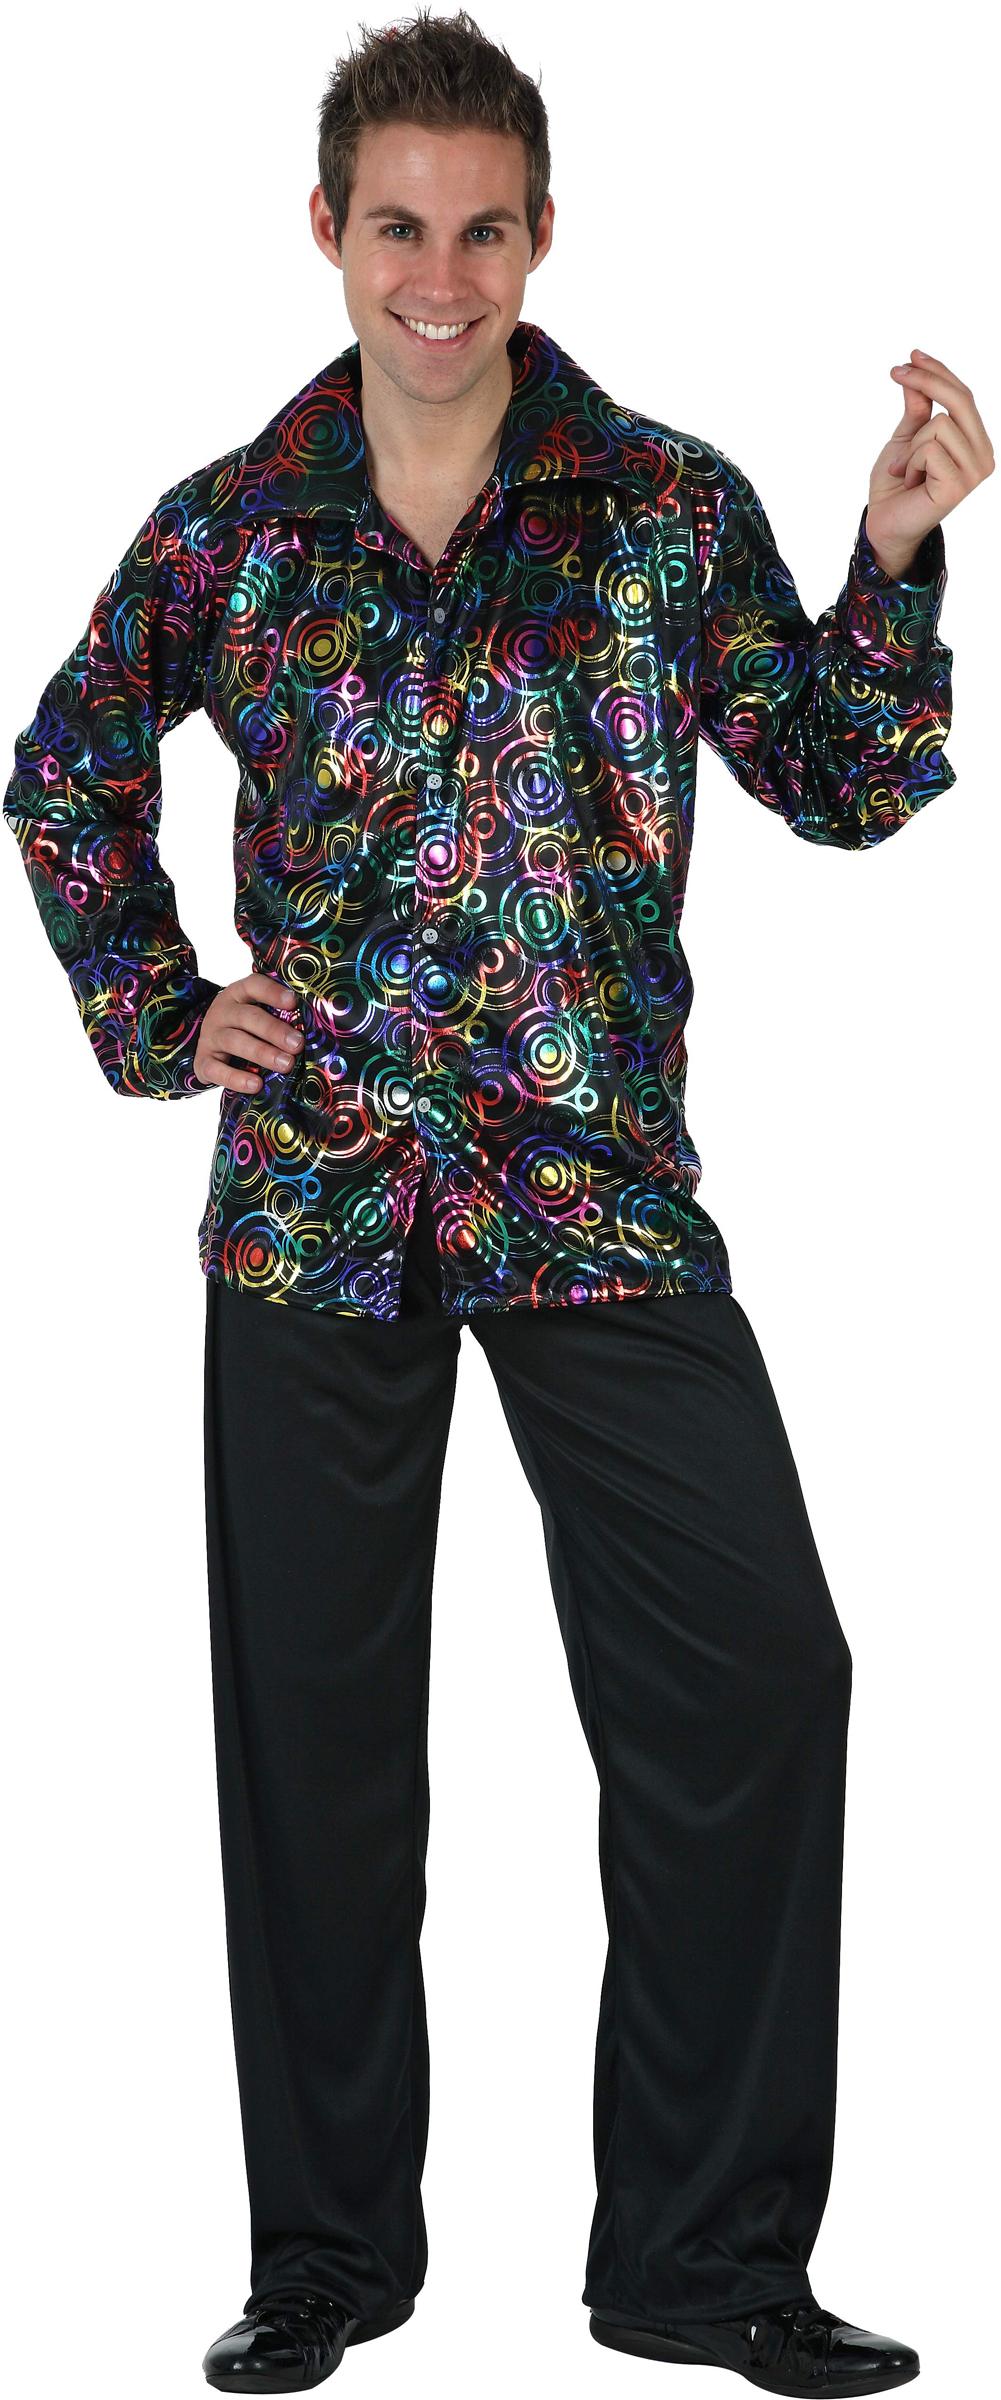 Disco costume for men